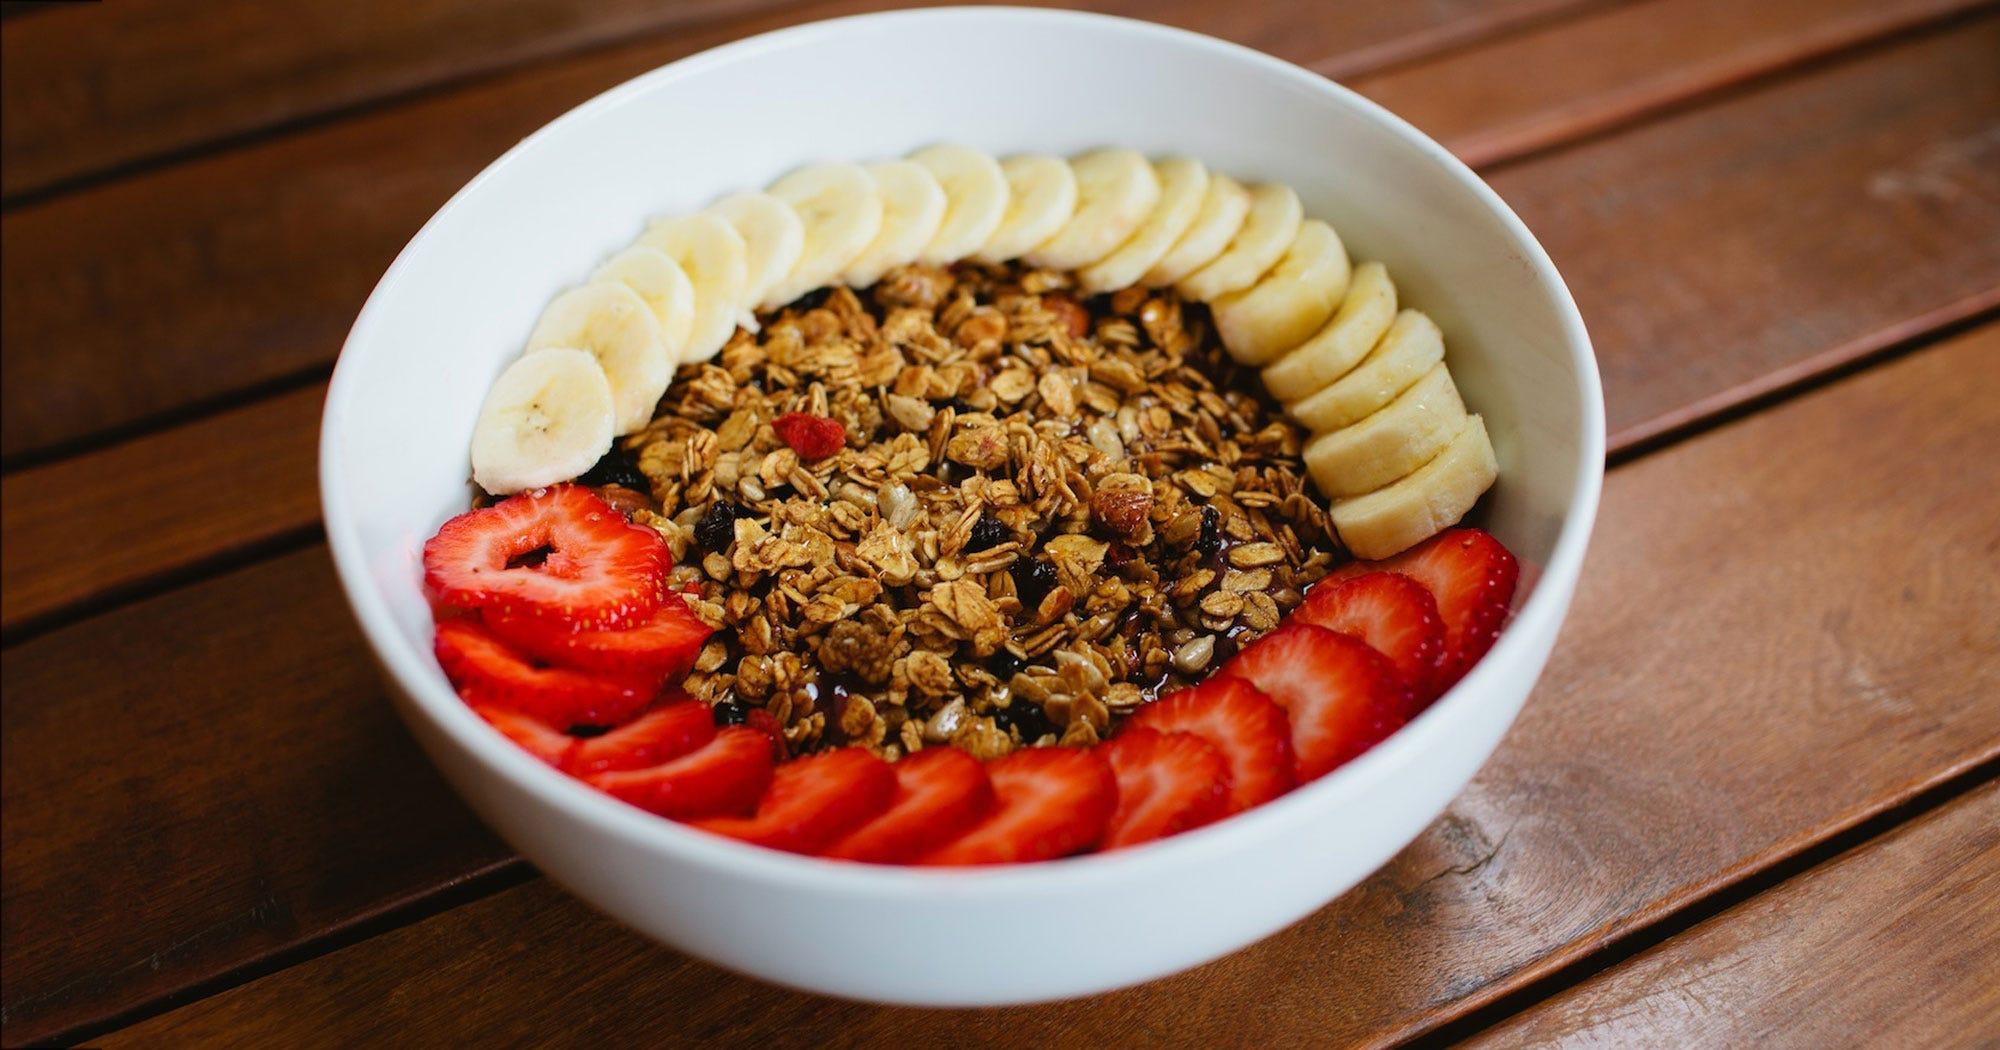 Best Vegan Bowls